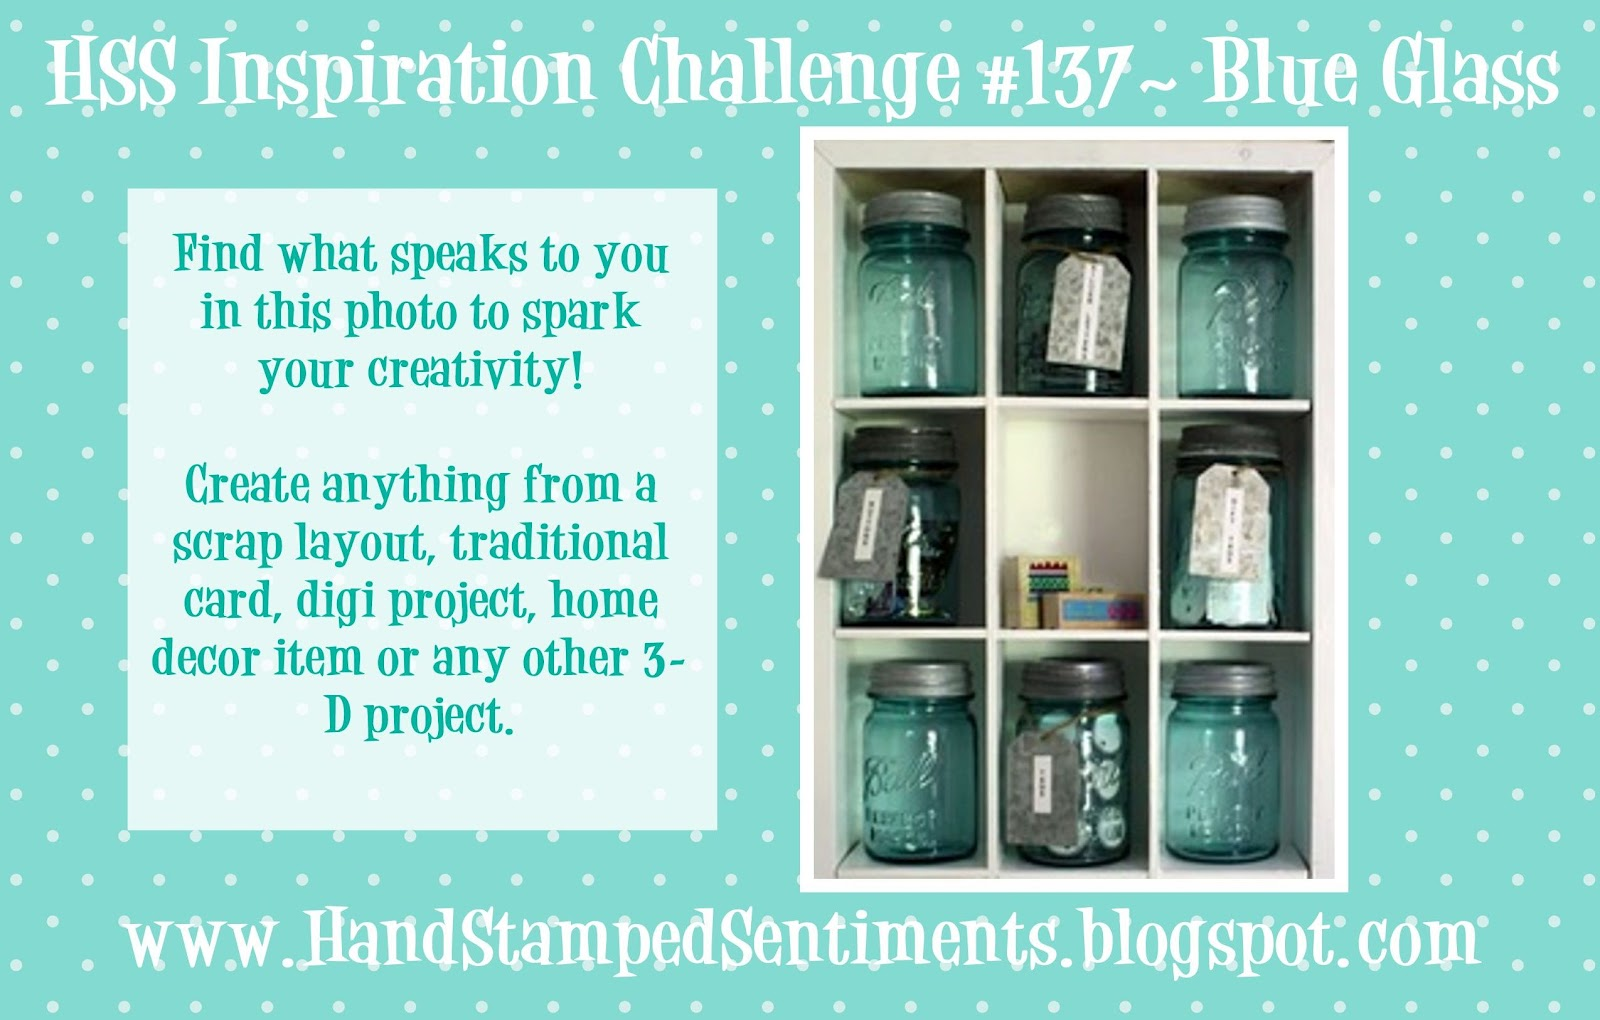 HSS challenge 137